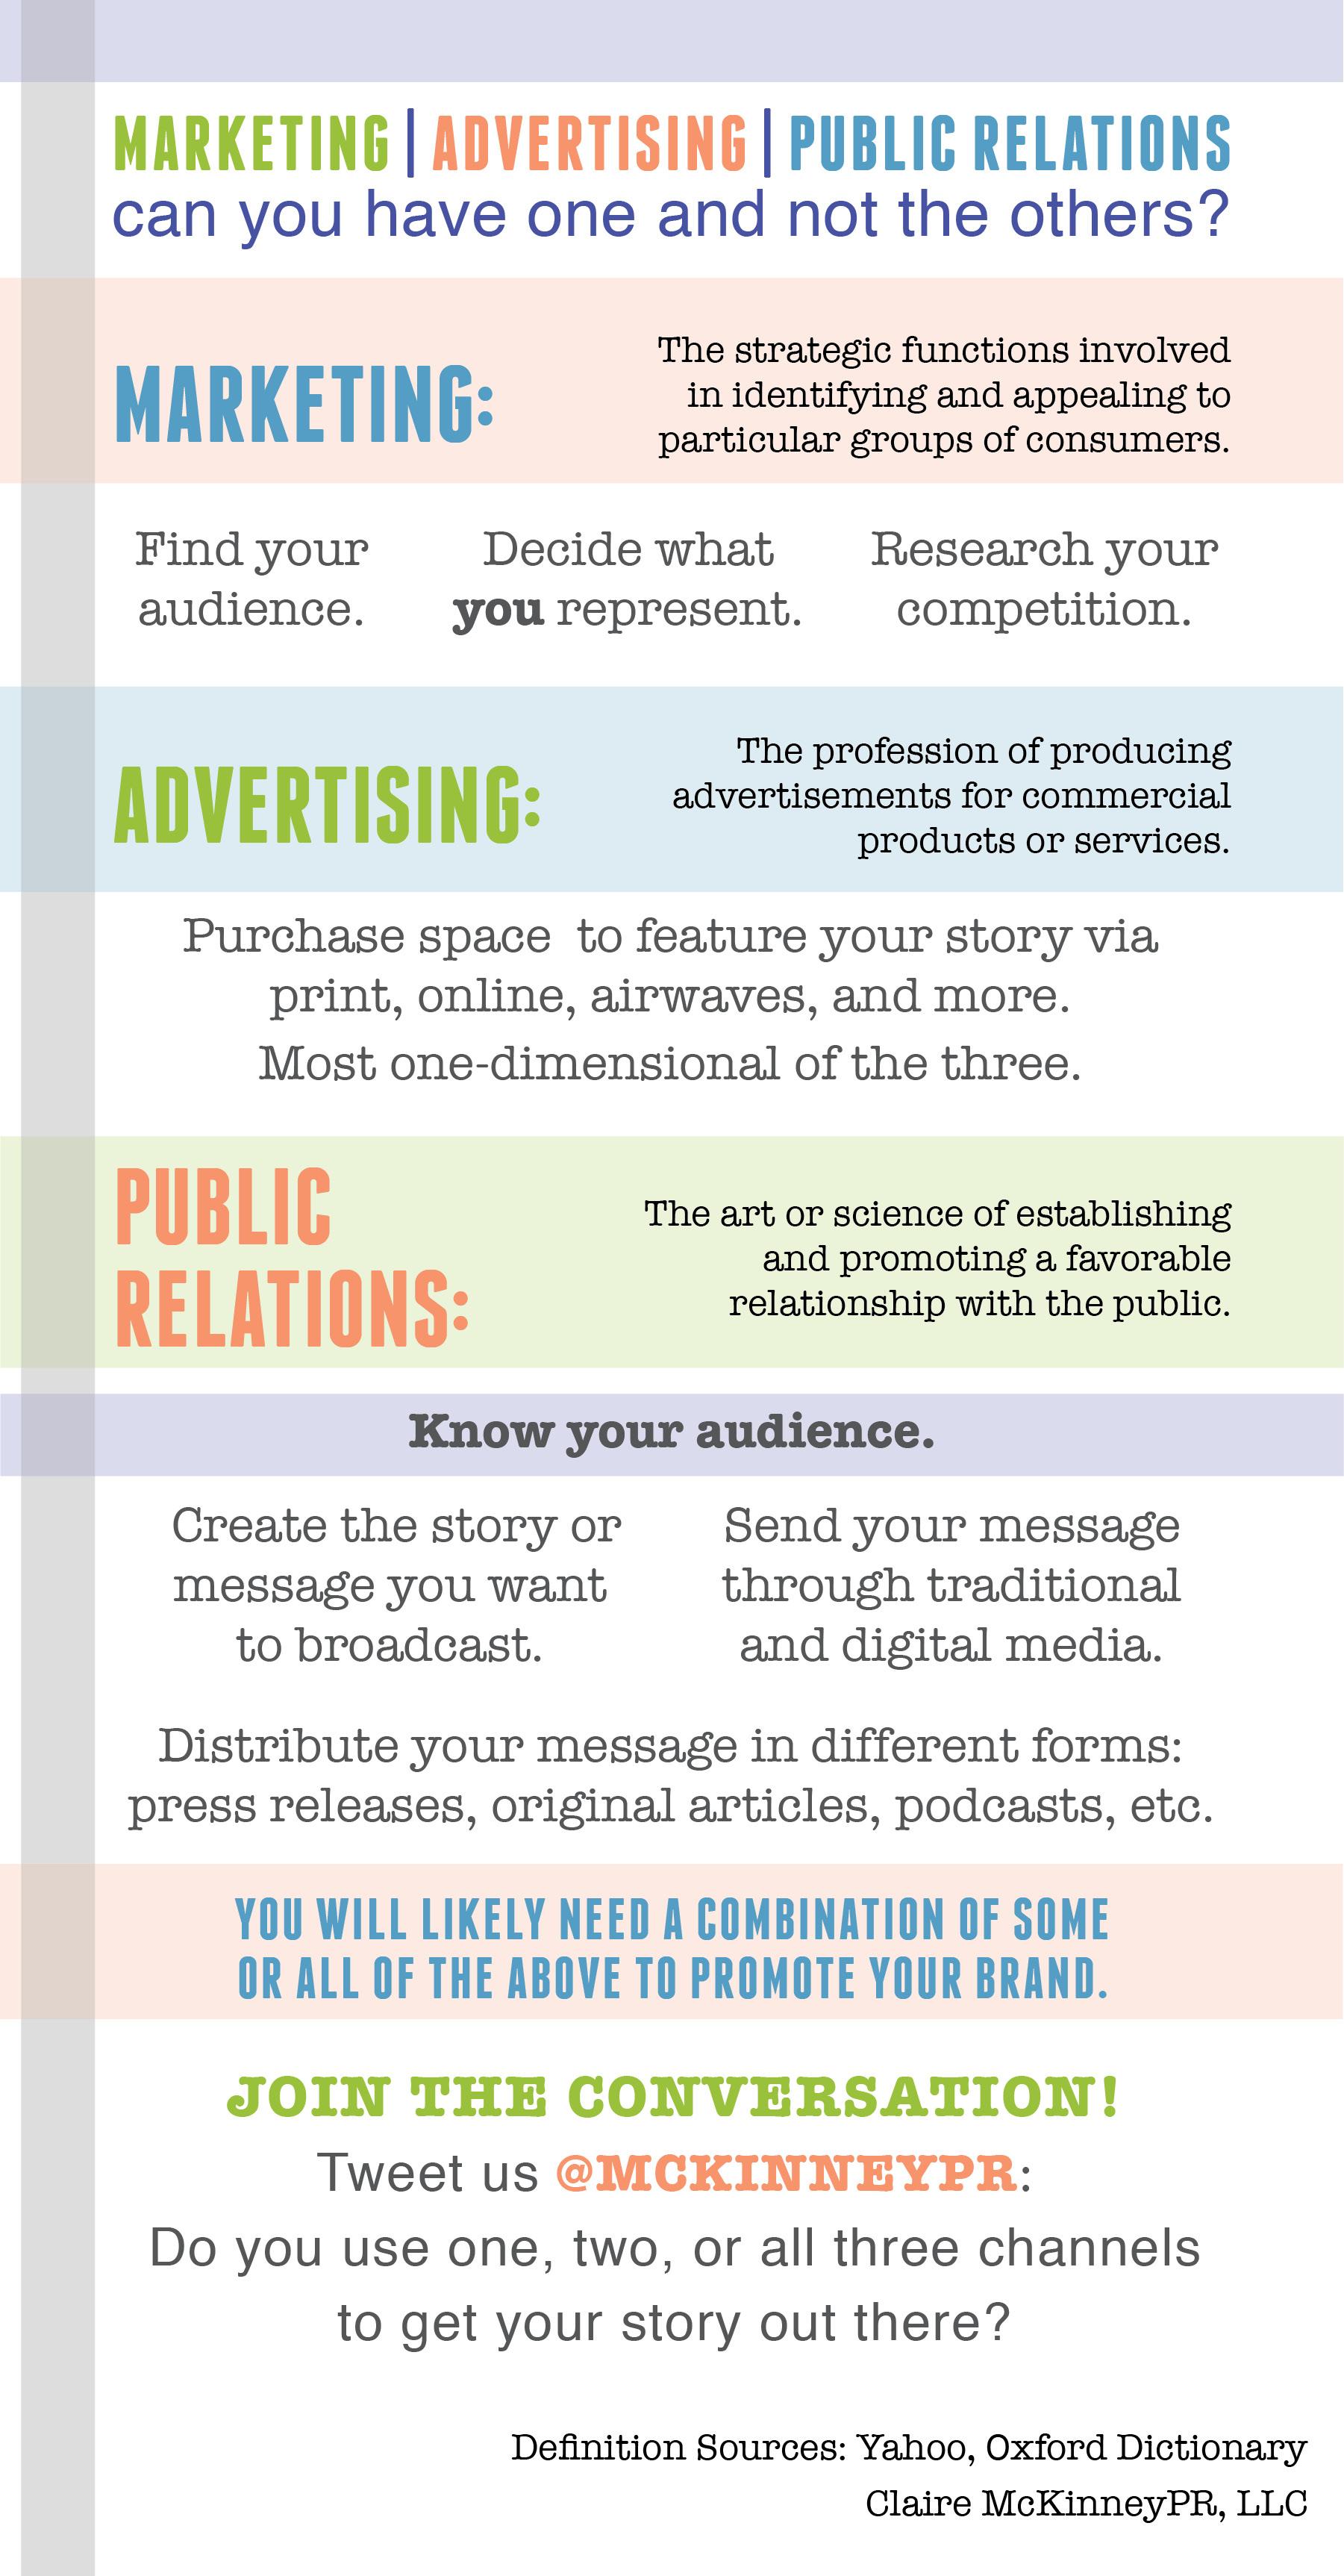 market-ad-pr-infographic